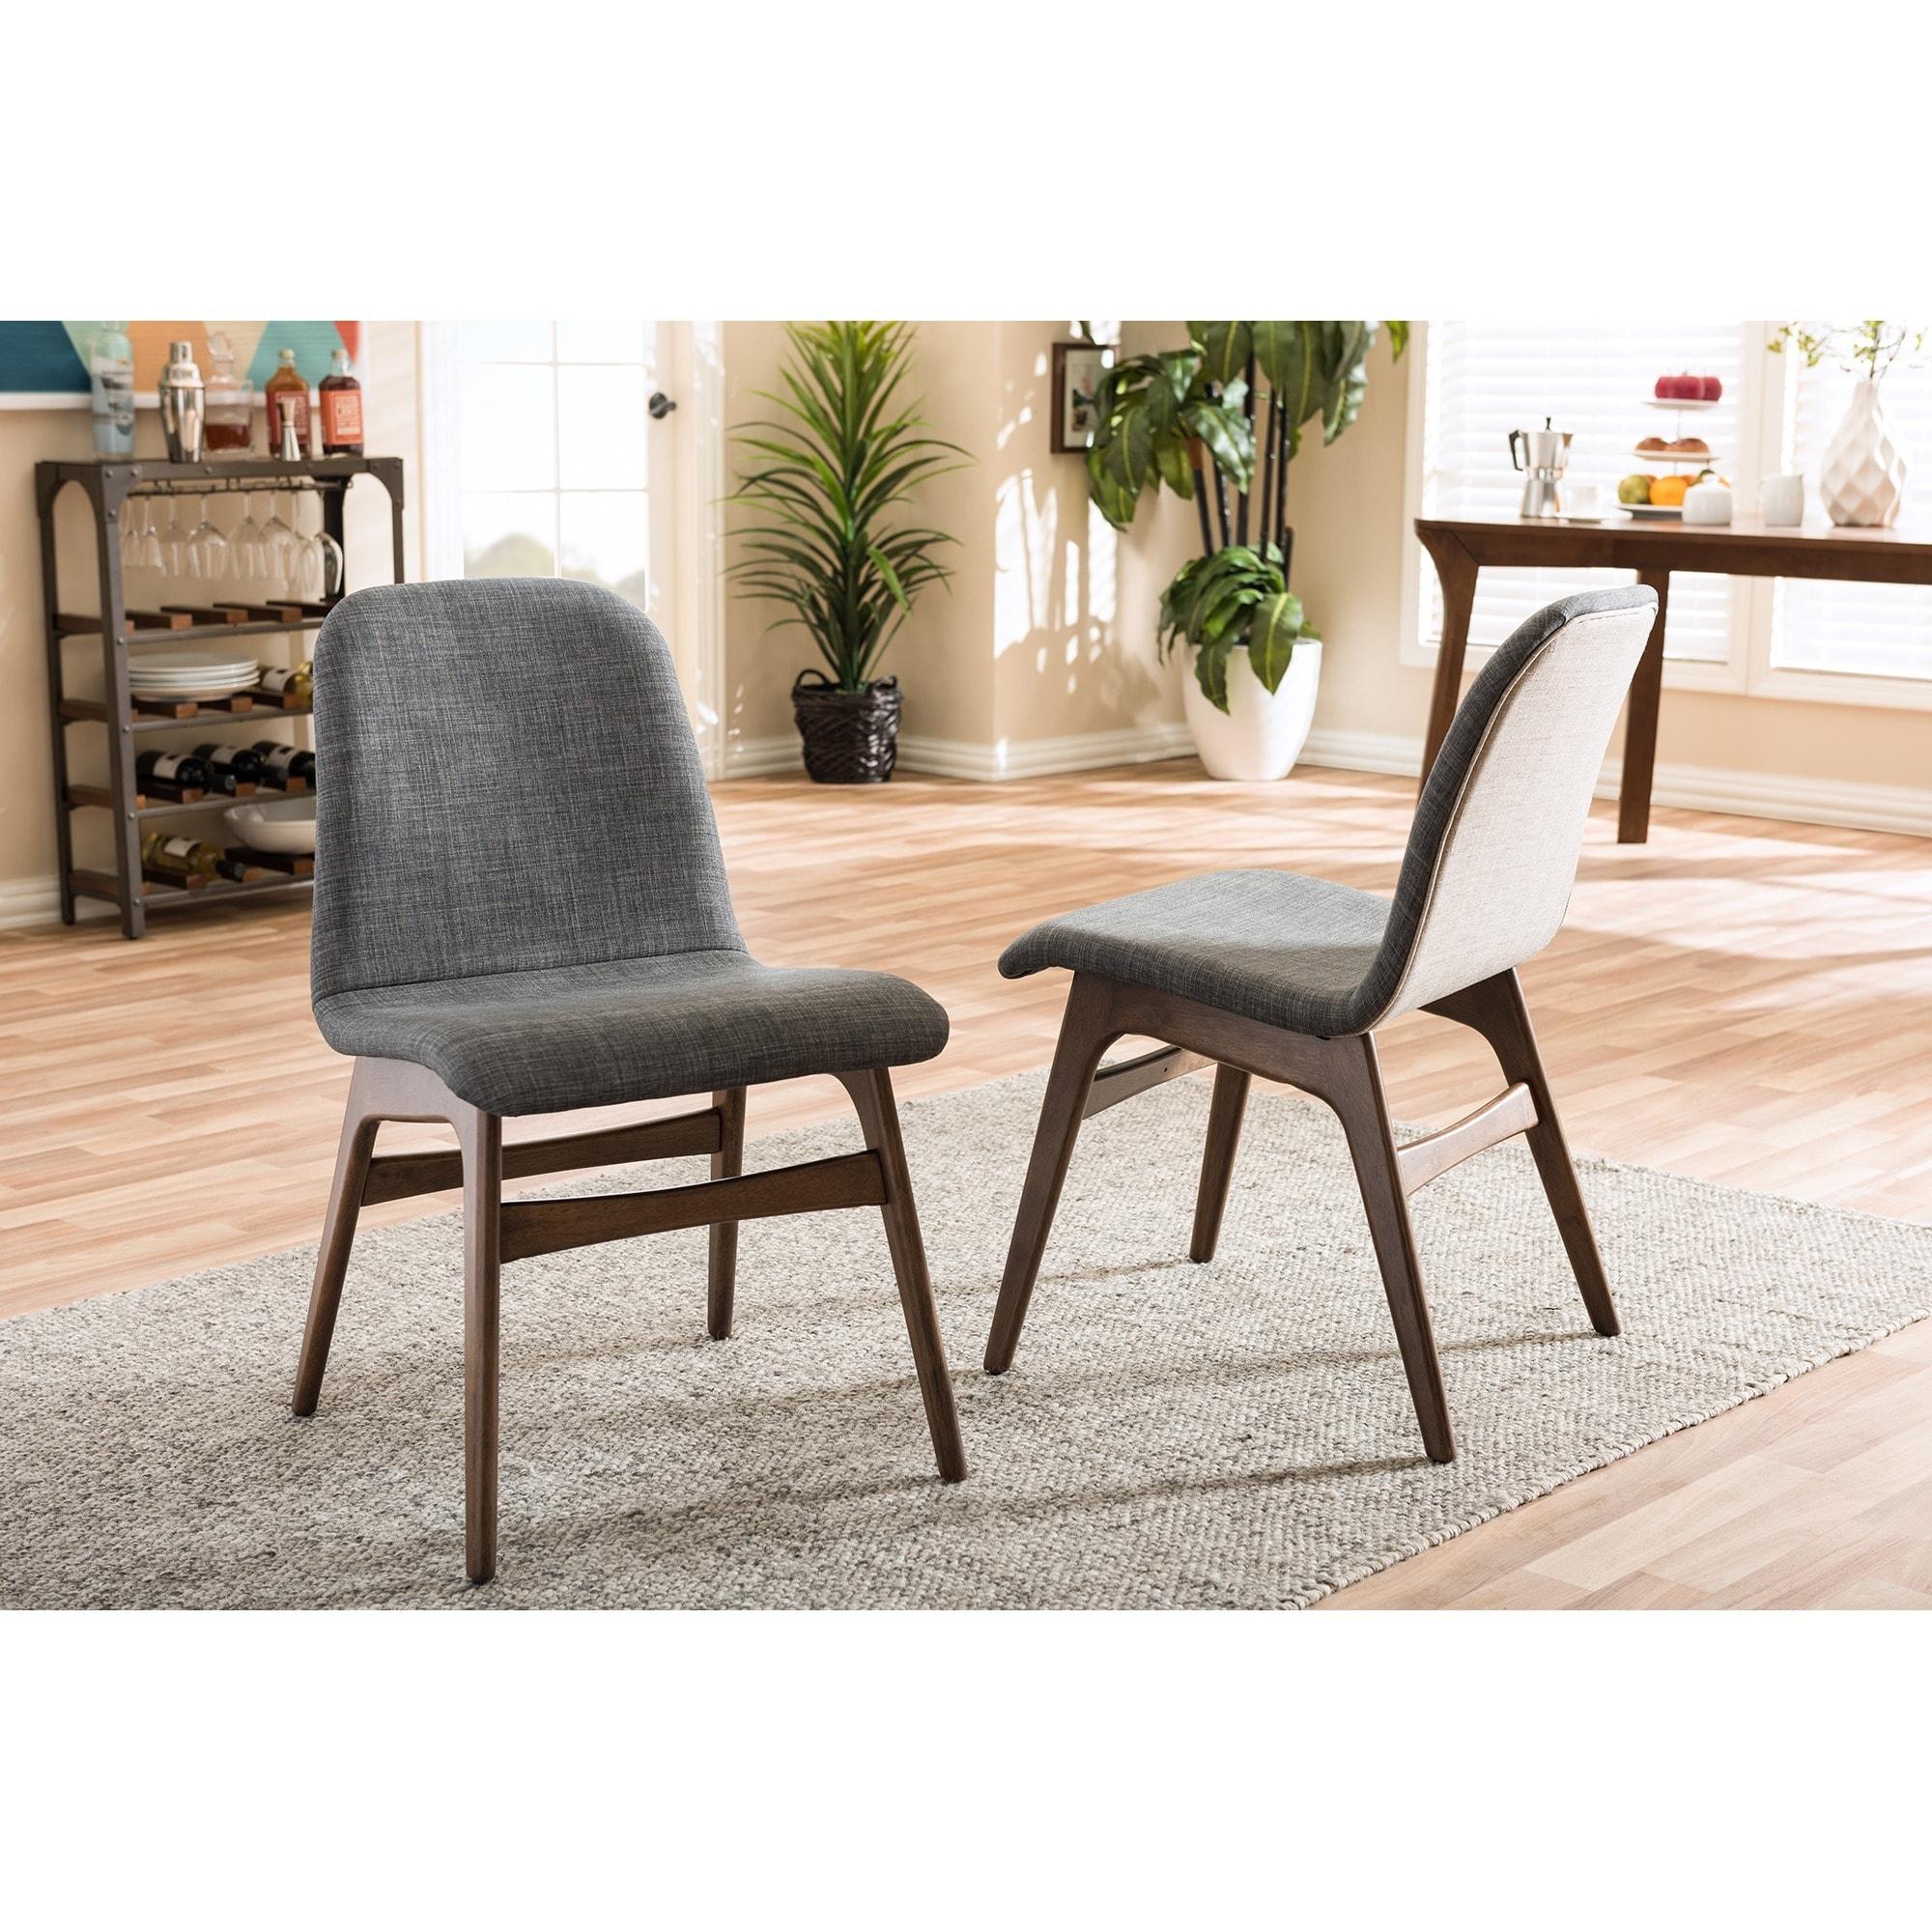 Baxton Studio Embrace Mid Century Retro Modern Scandinavian Style Dark Grey Fabric Upholstered Walnut Finish Dining Chair Set 2